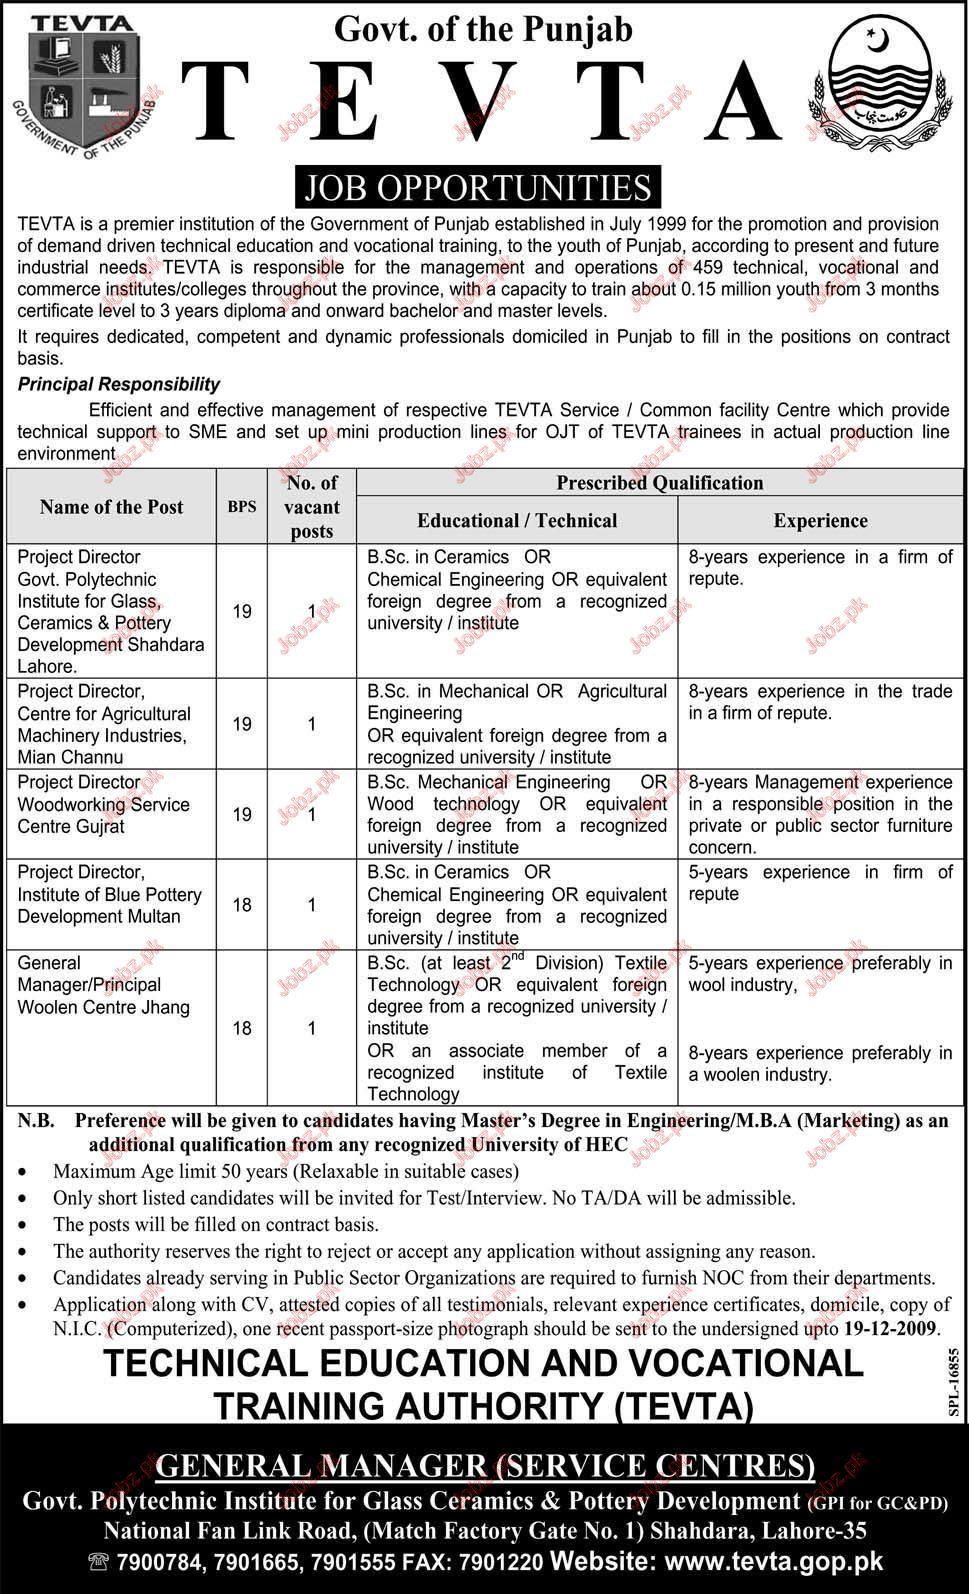 tevta govt of the punjab 2017 pakistan jobz pk